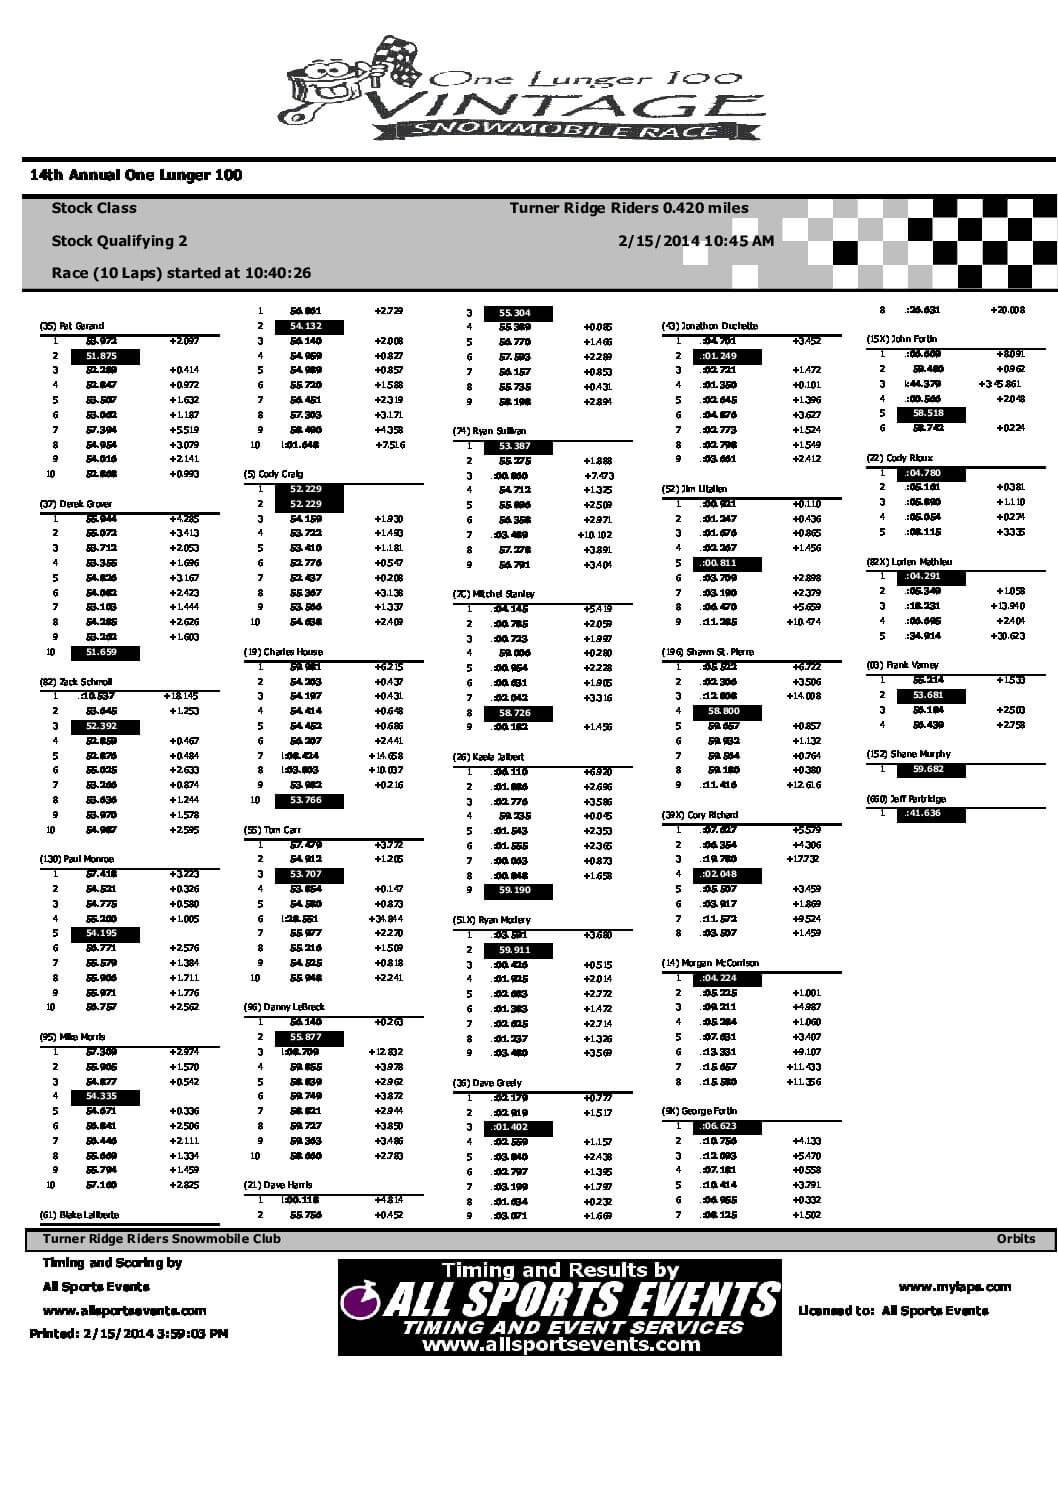 StockFinalsLapTimes2014.pdf